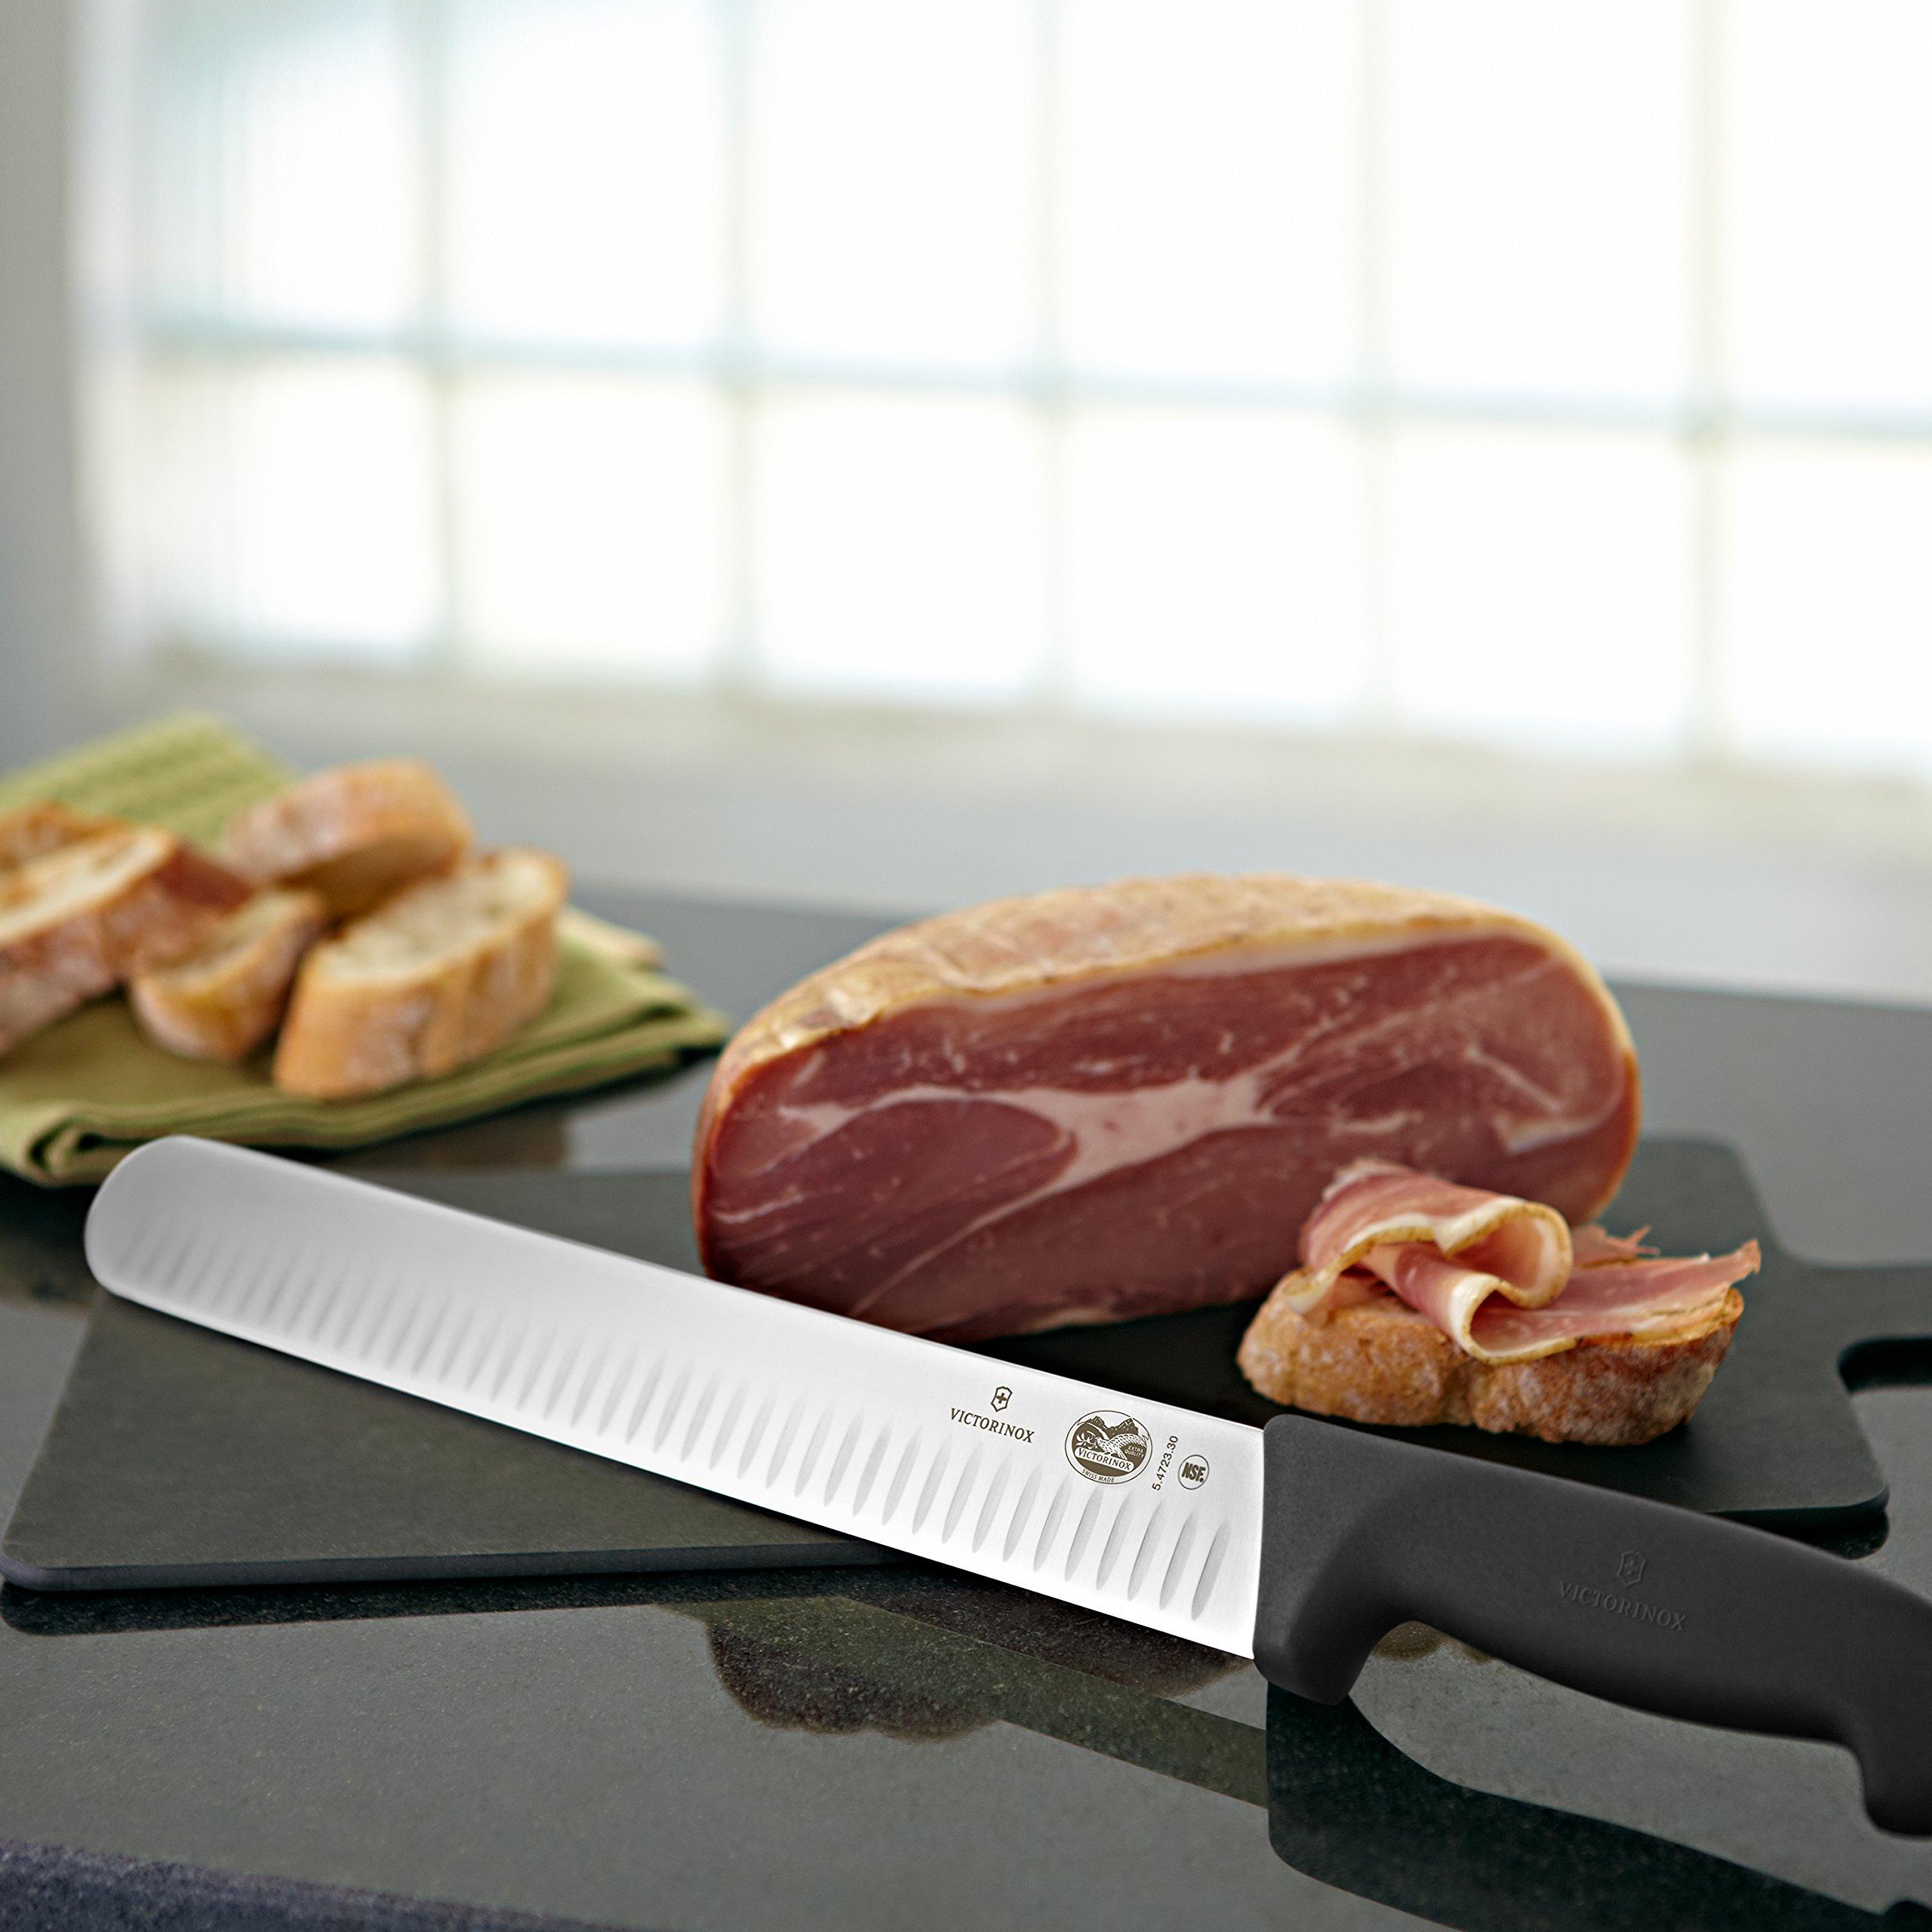 Victorinox 12 Inch Fibrox Pro Slicing Knife with Granton Blade by Victorinox (Image #3)